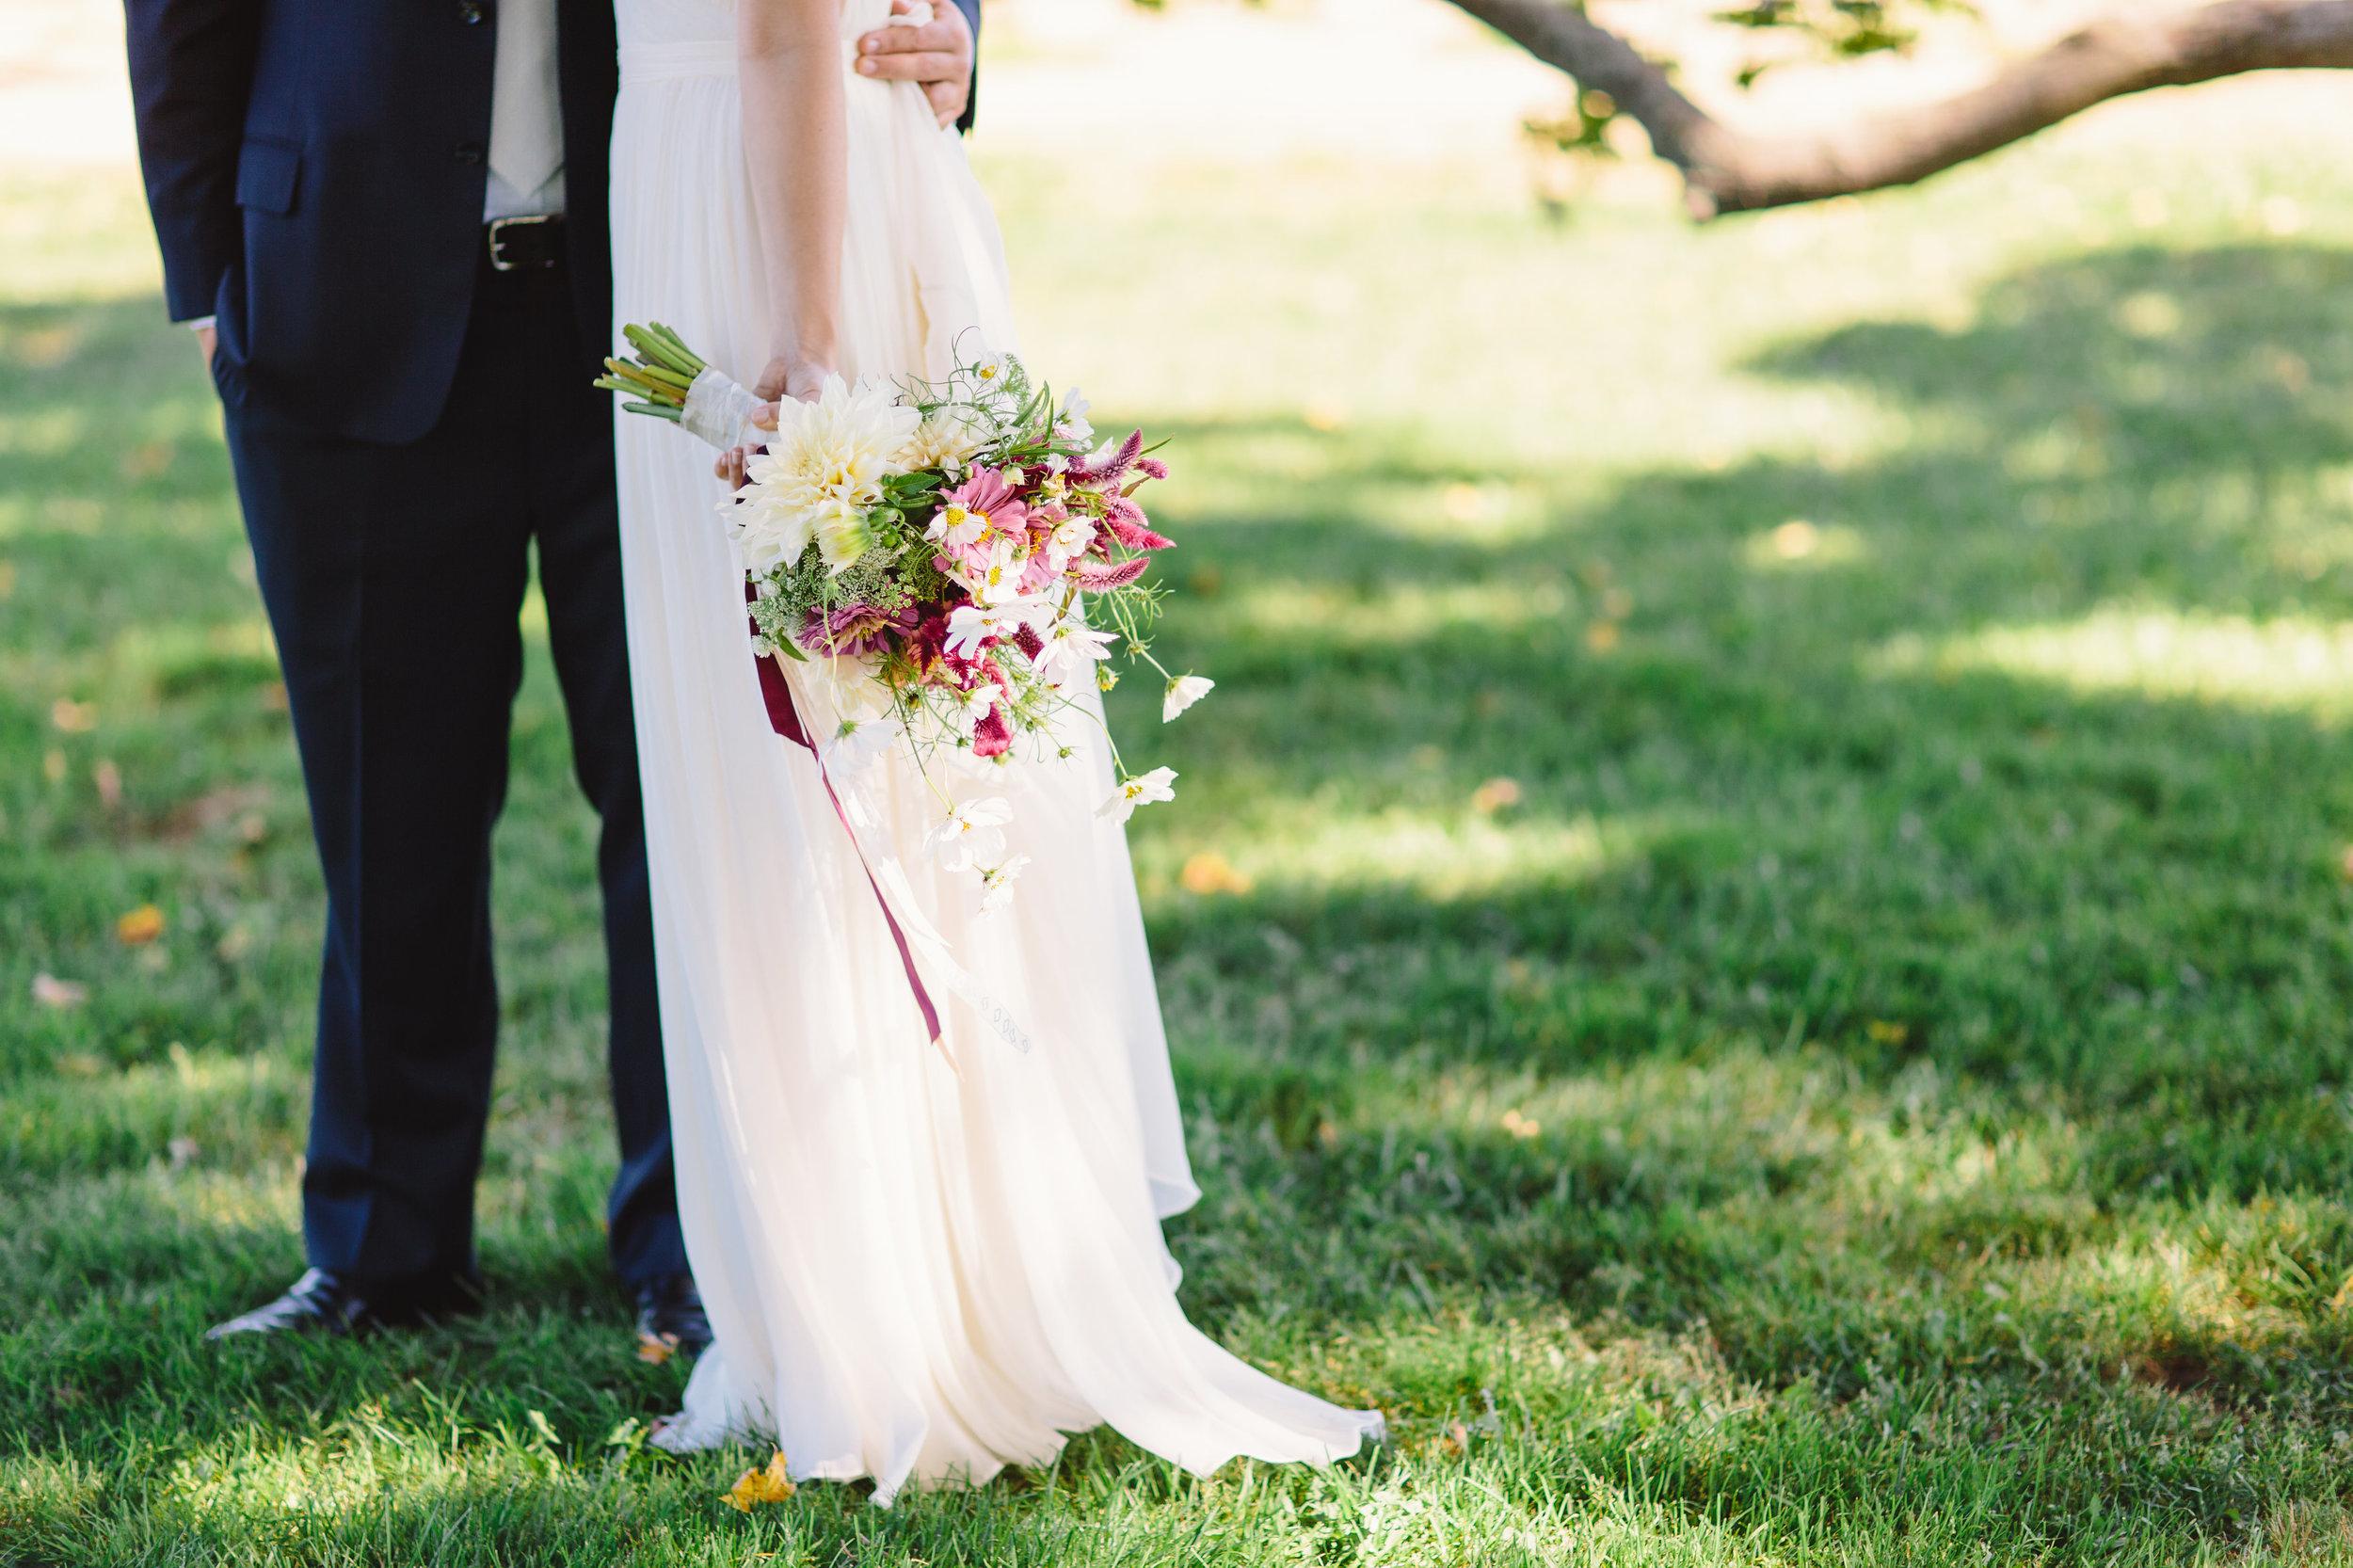 marial-daniel-wedding-balls-falls-sara-wilde-photography-0298 (1).jpg